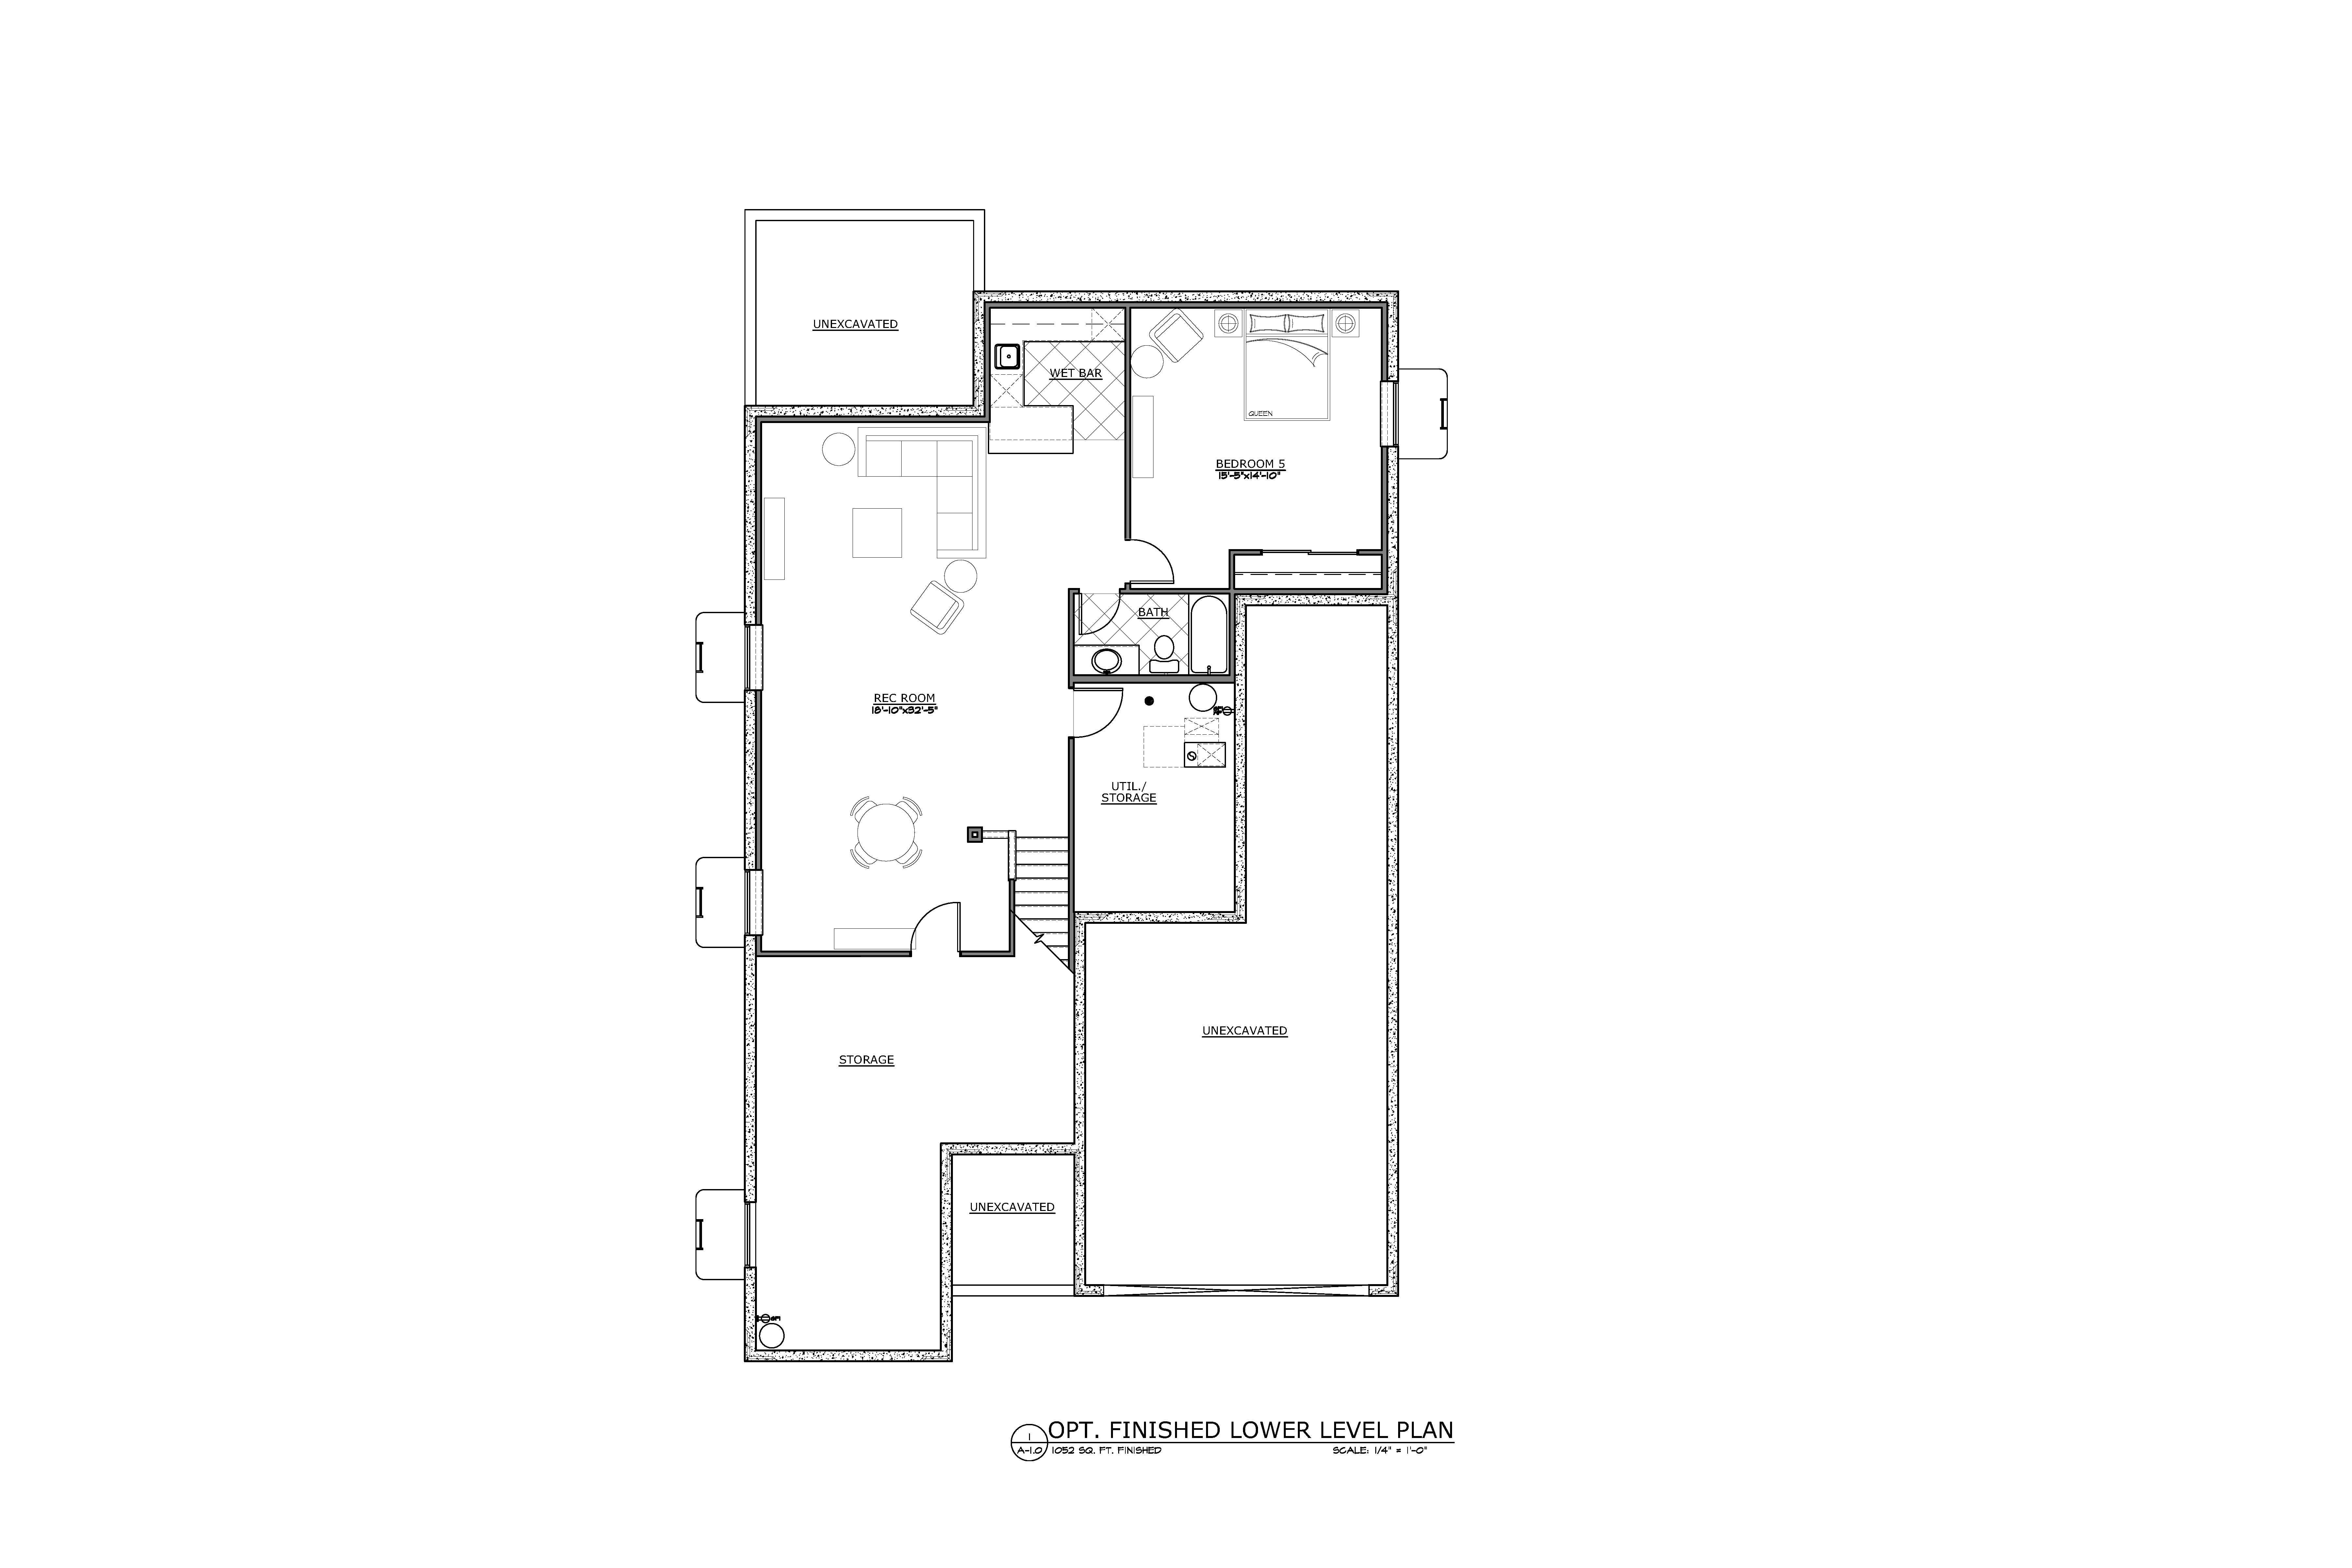 04_tabernash_basement_floor_plan